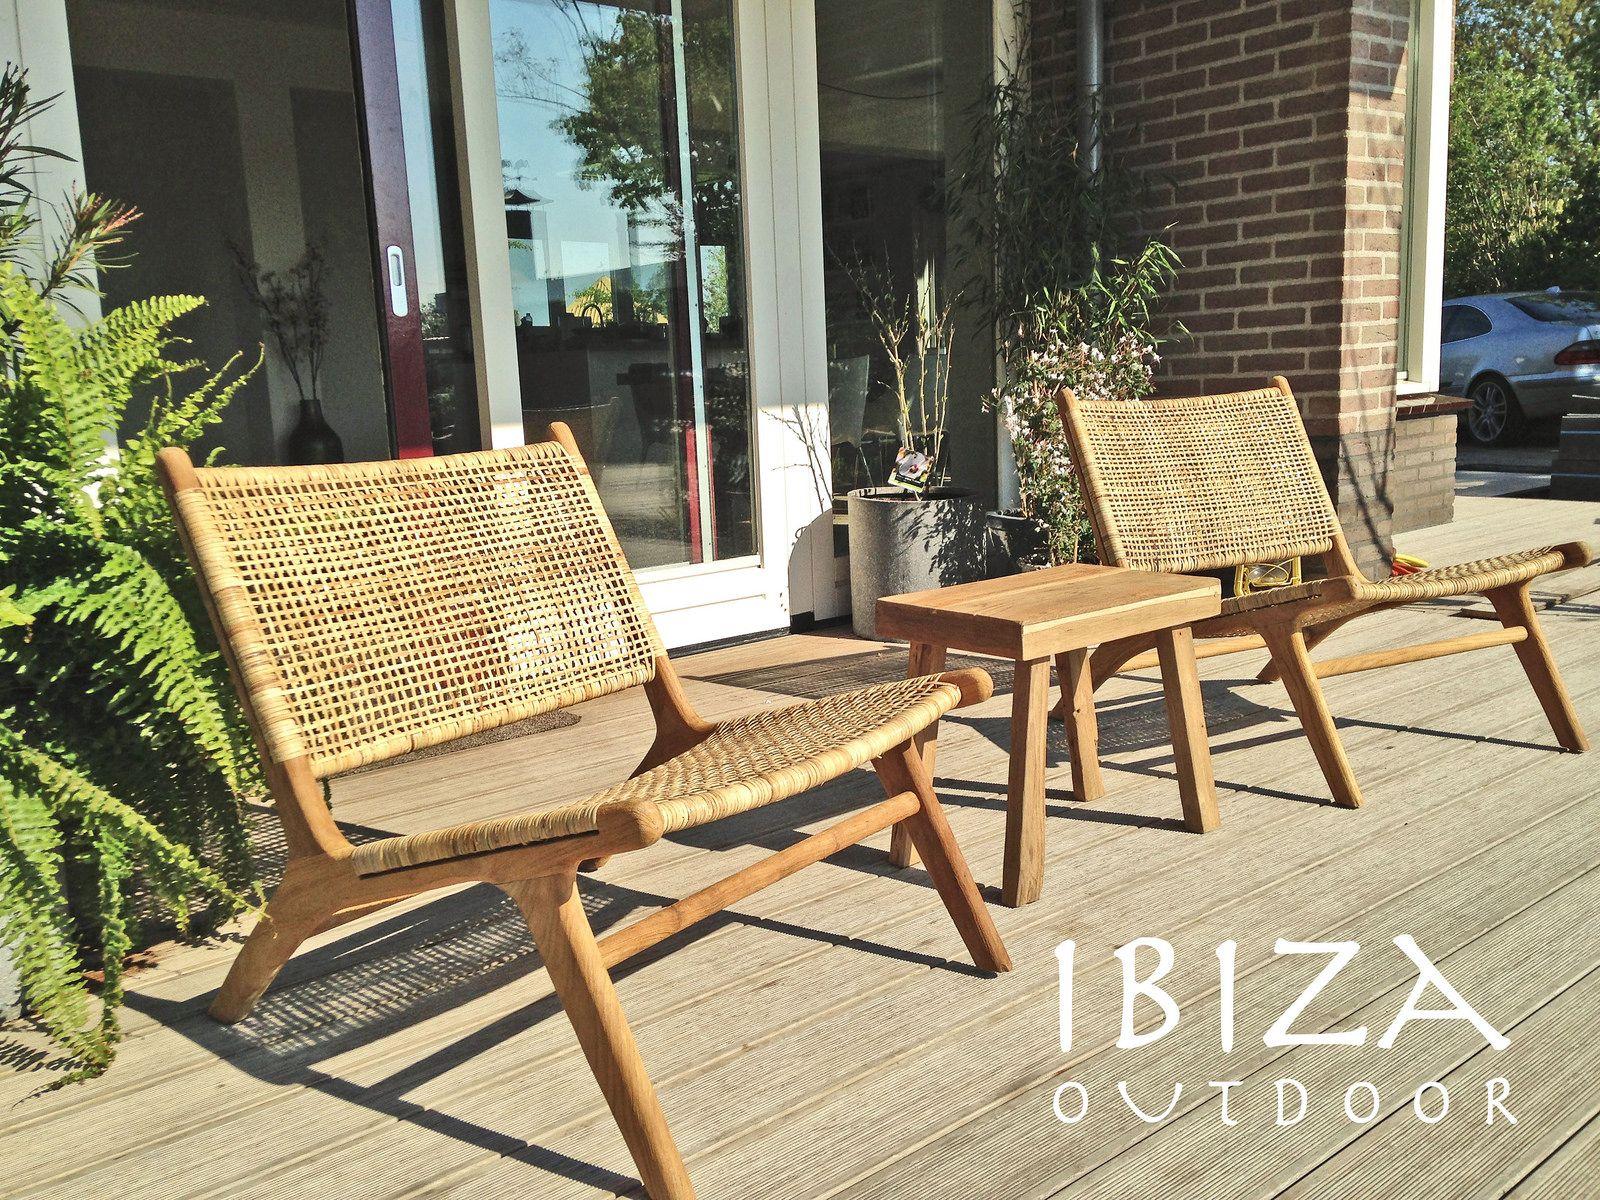 Ushuaia Lounge Stoel.Ushuaia Rotan Lounge Stoel In 2020 Outdoor Chairs Scandinavian